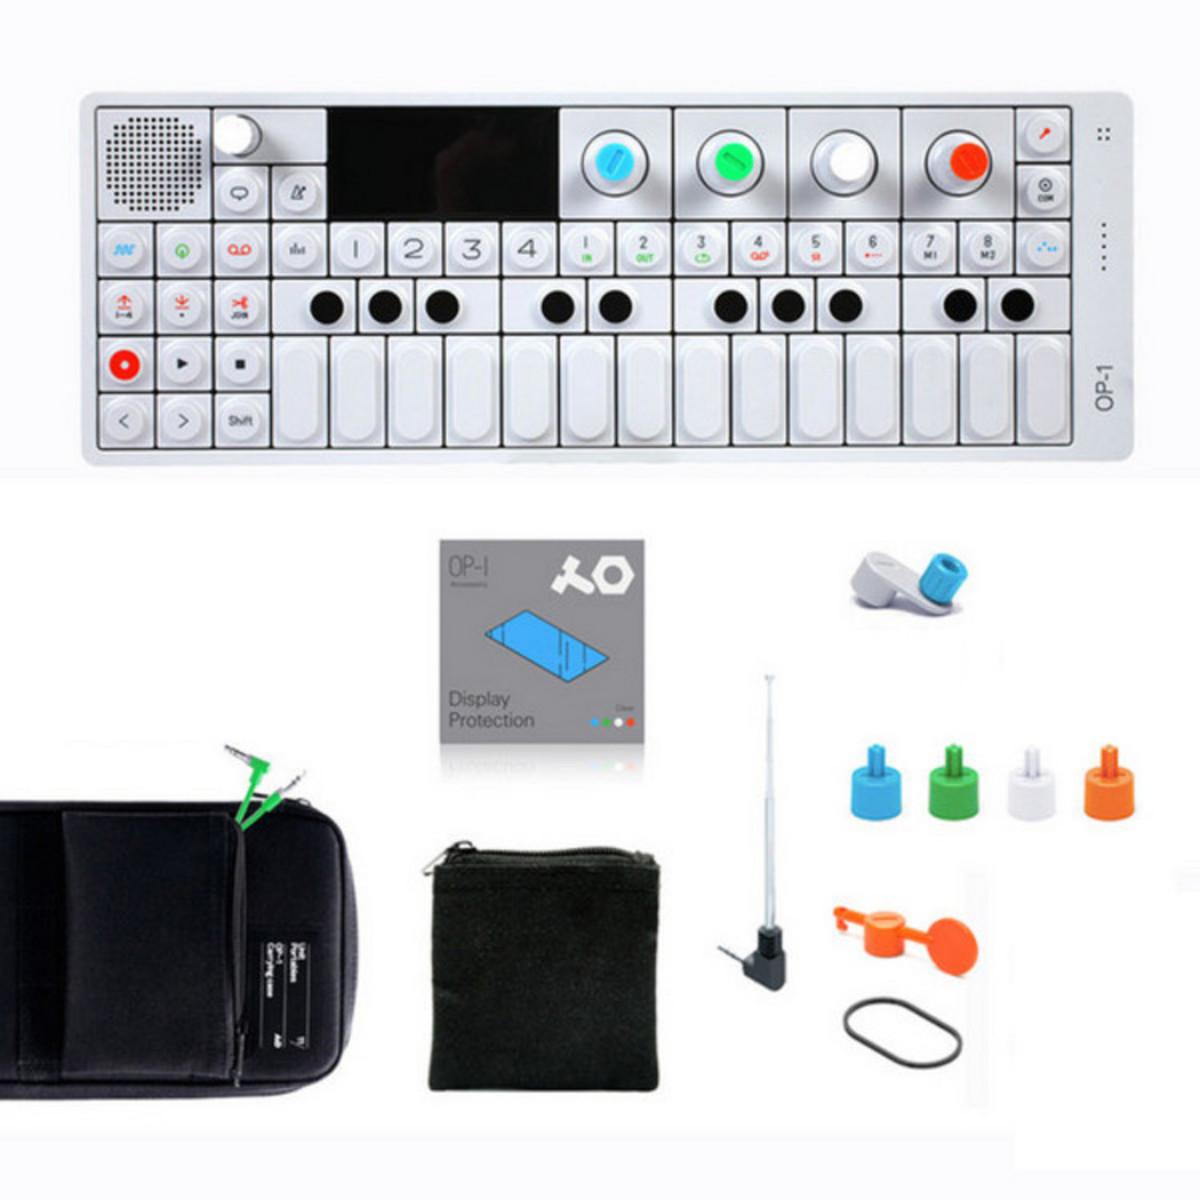 DISC Teenage Engineering OP-1 and Accessory Kit Bundle